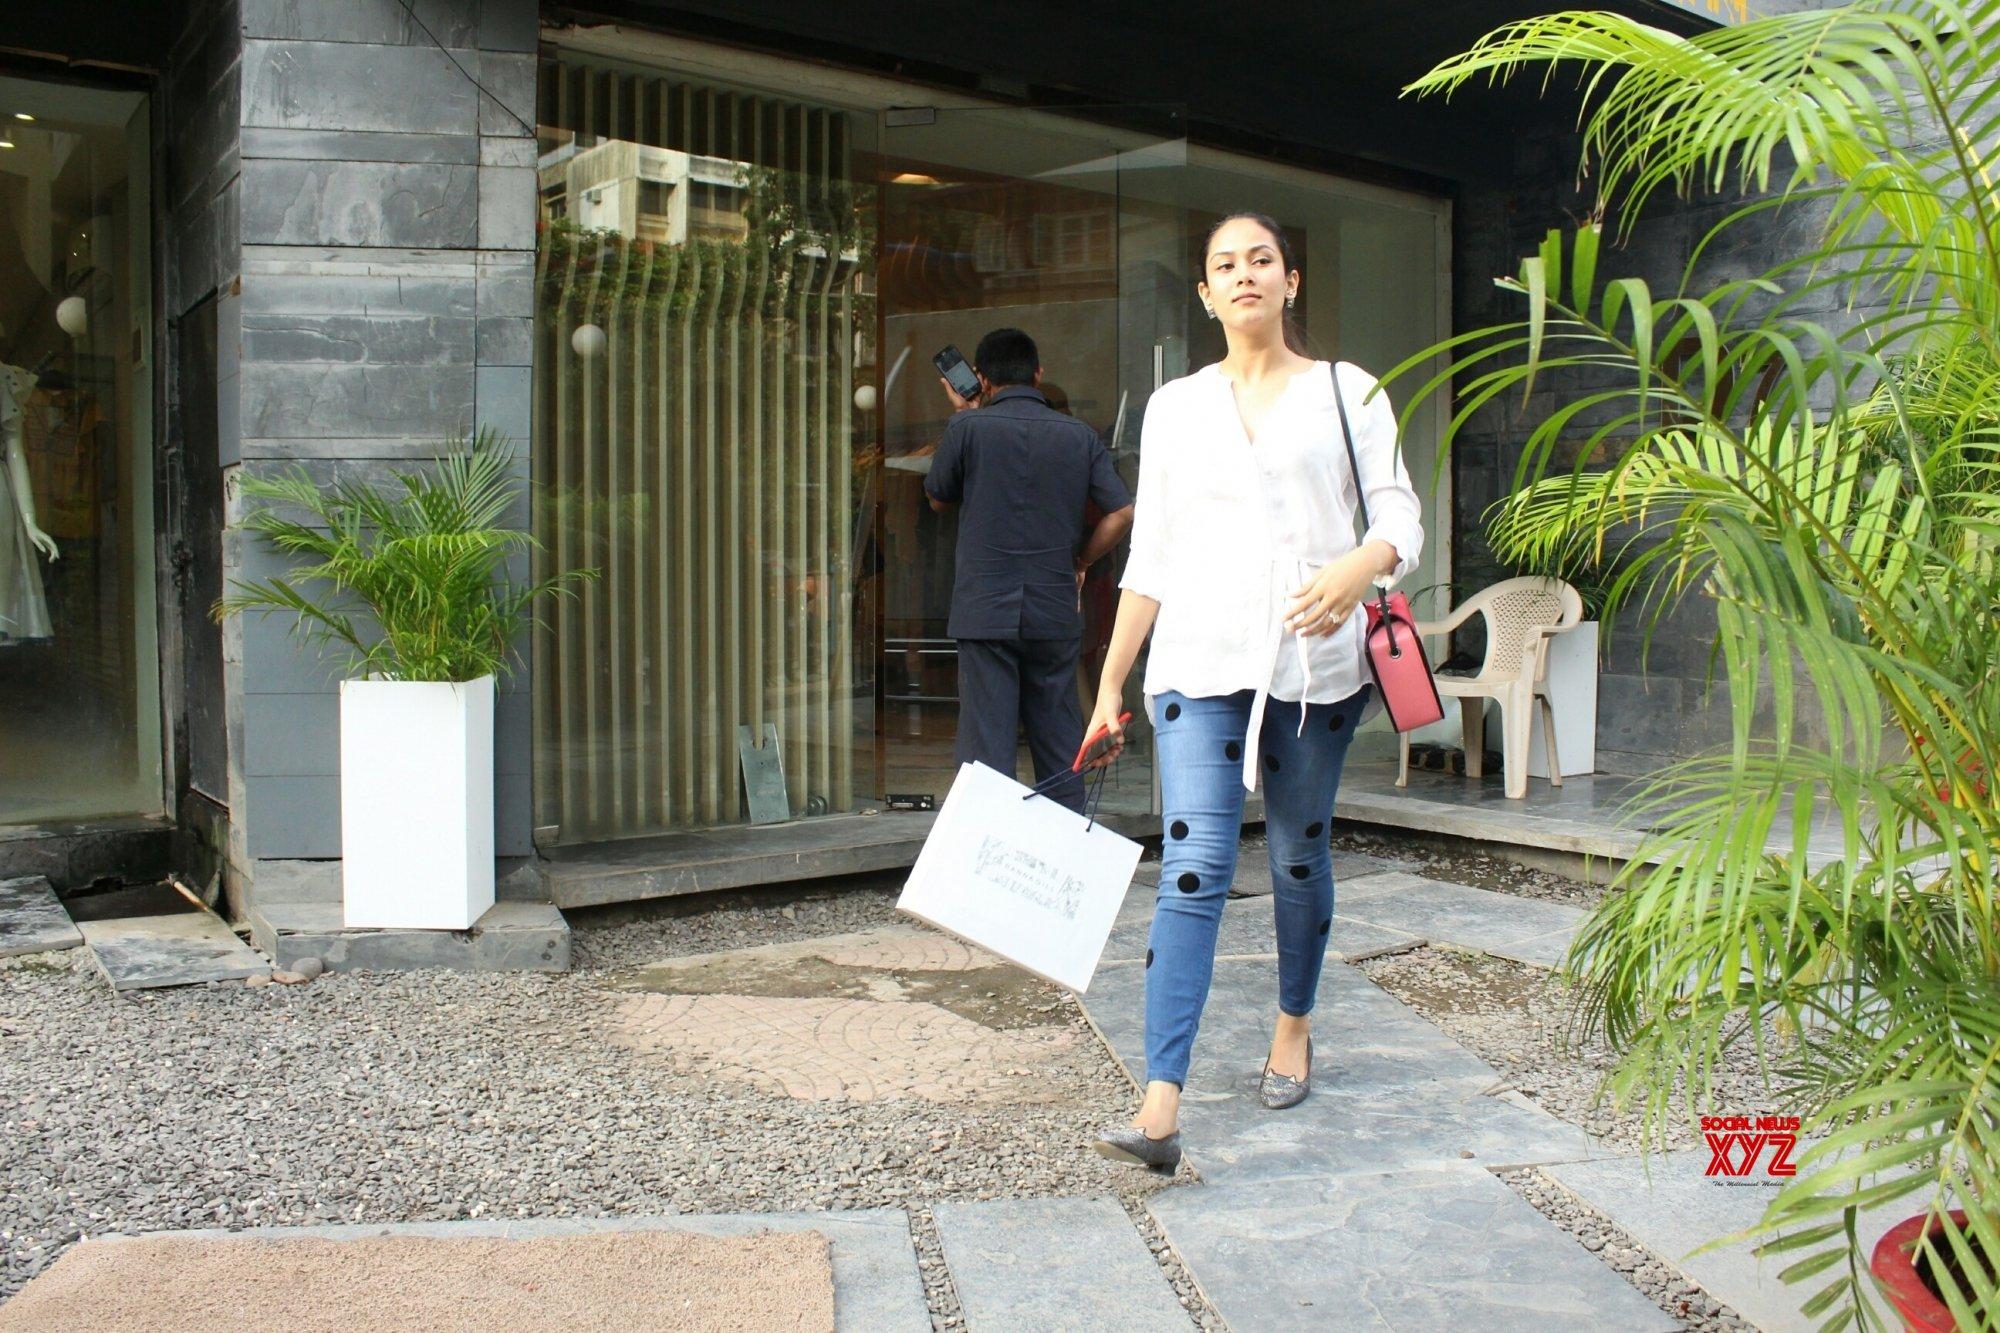 Doesn't make sense to get serious about everything: Mira Rajput Kapoor